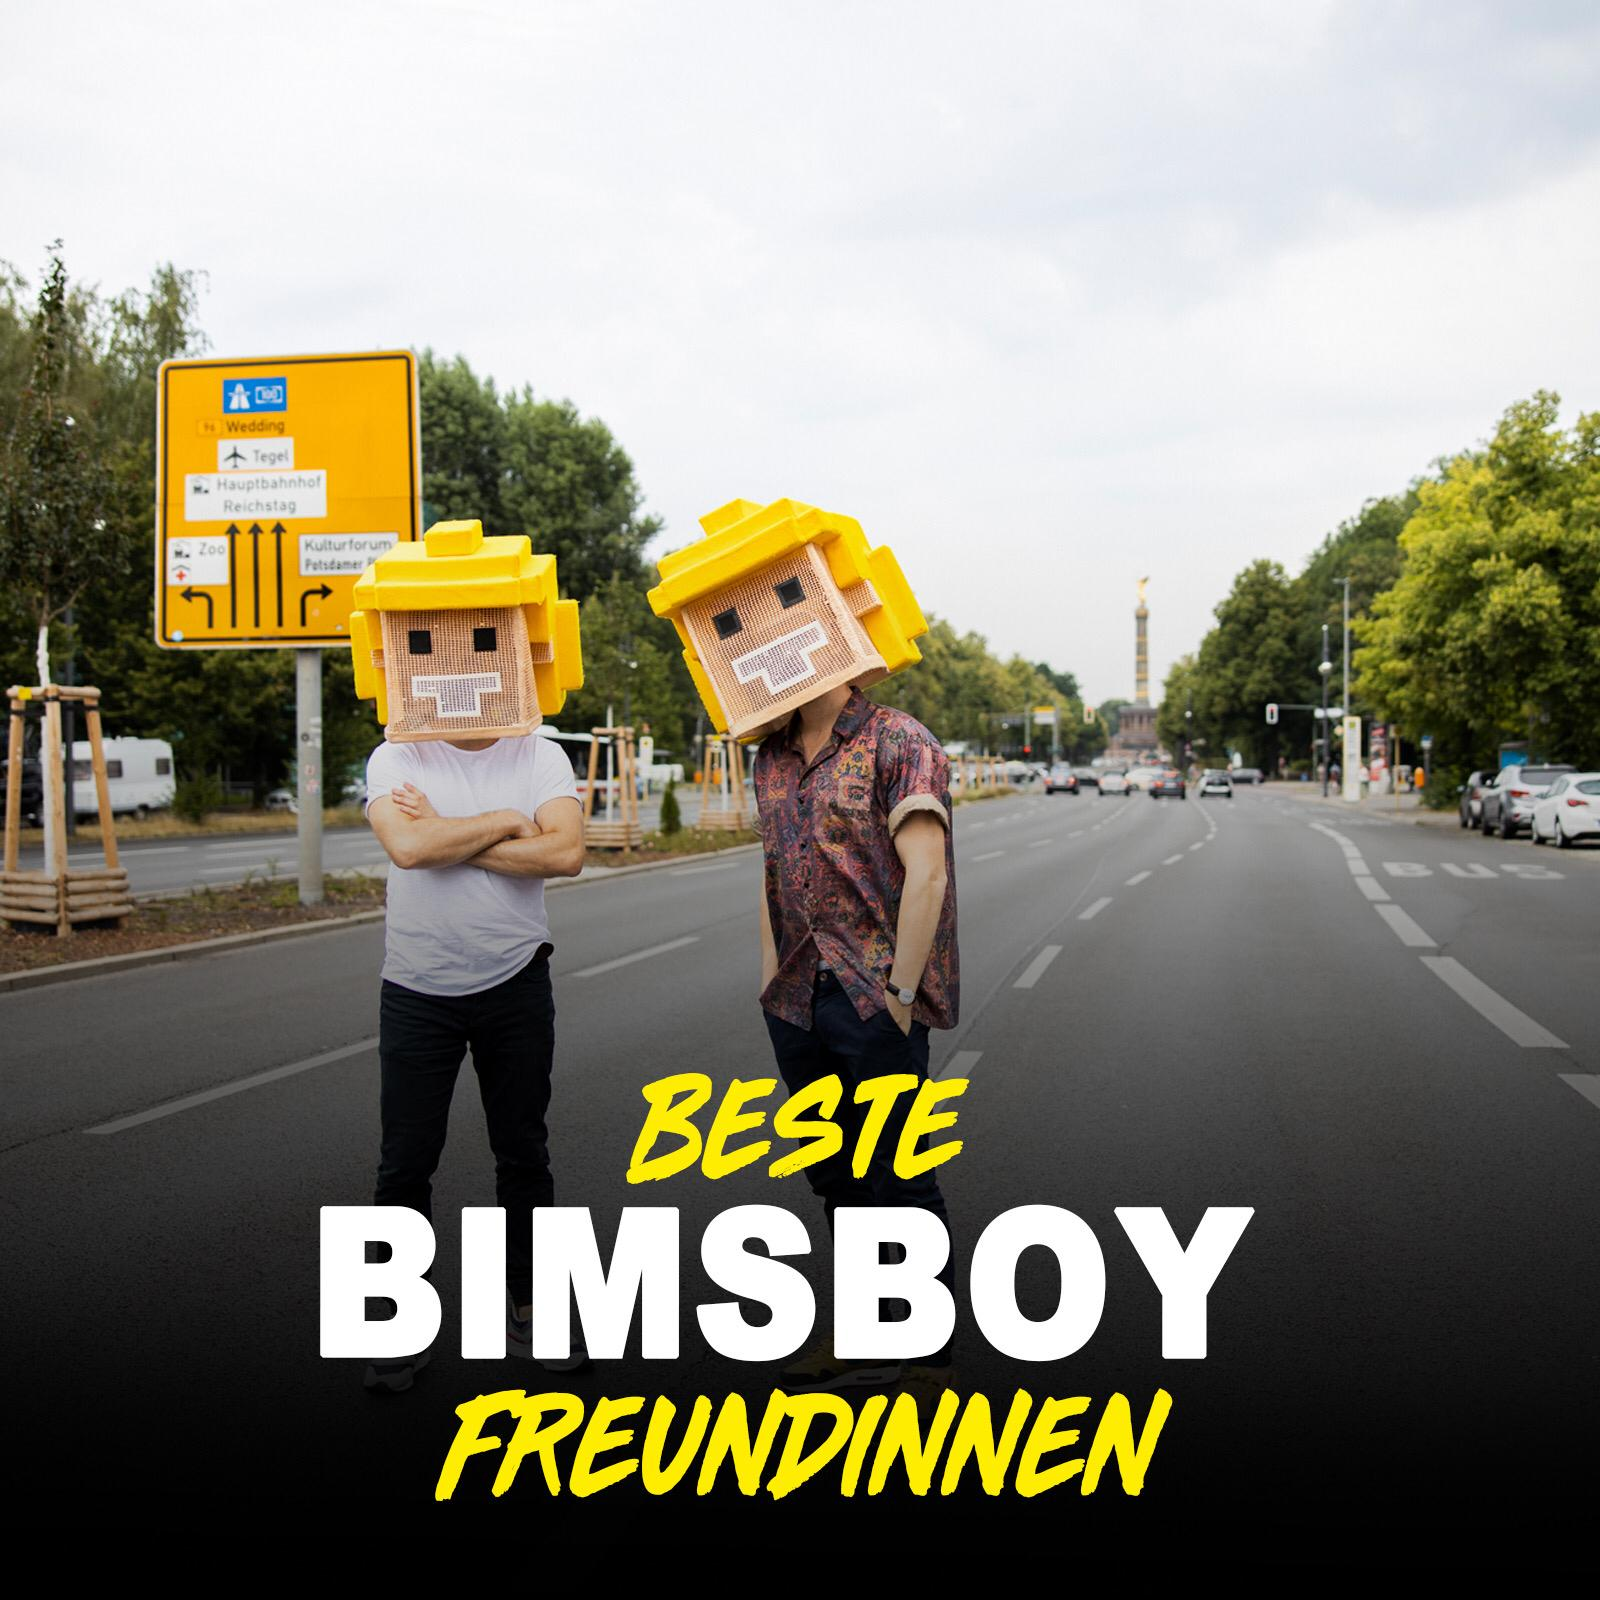 Bimsboy